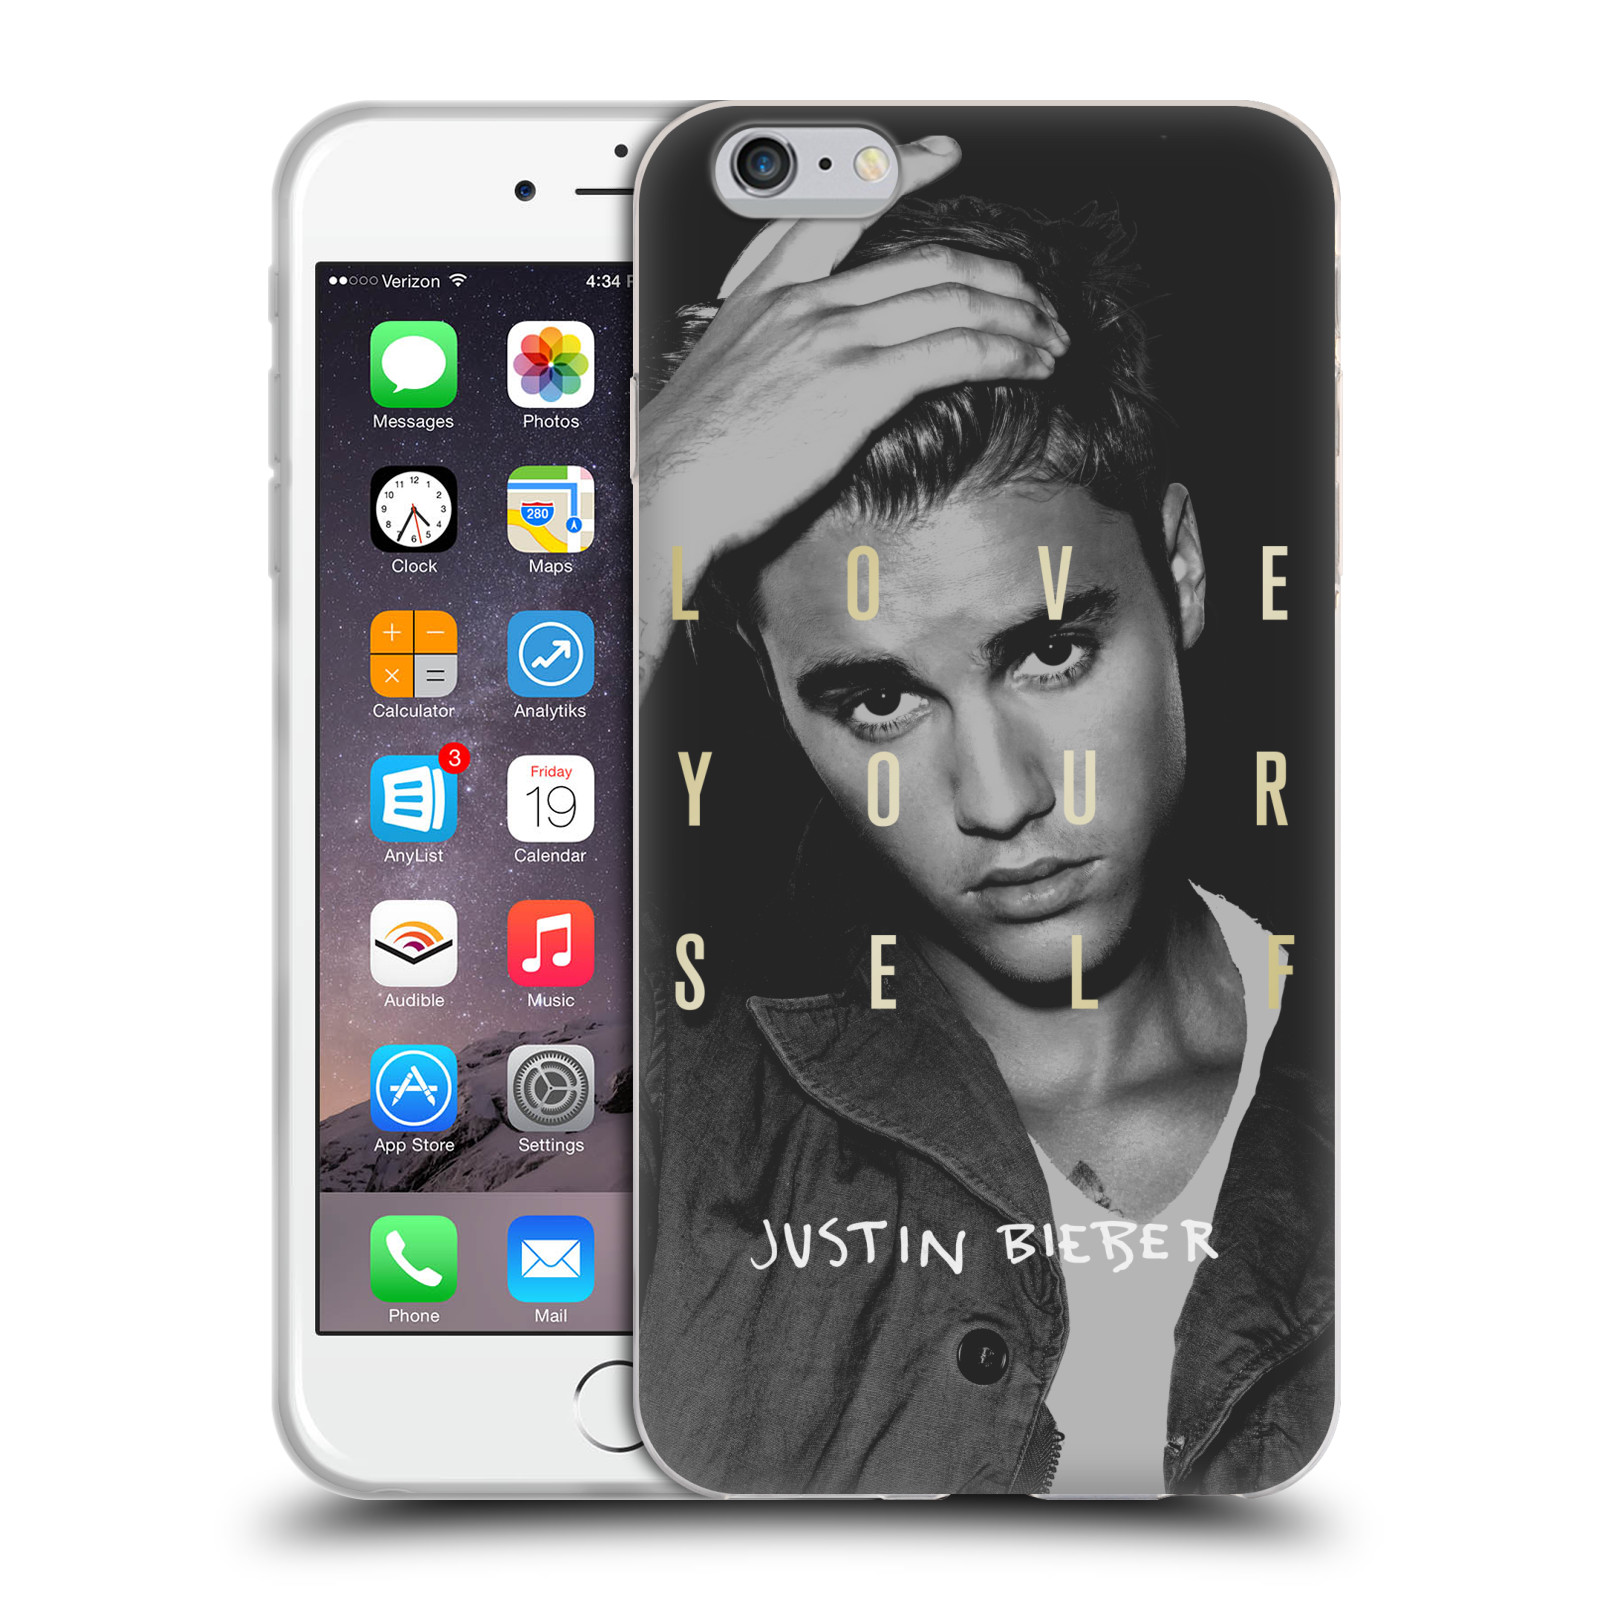 HEAD CASE silikonový obal na mobil Apple Iphone 6 PLUS / 6S PLUS originální potisk Justin Bieber foto text